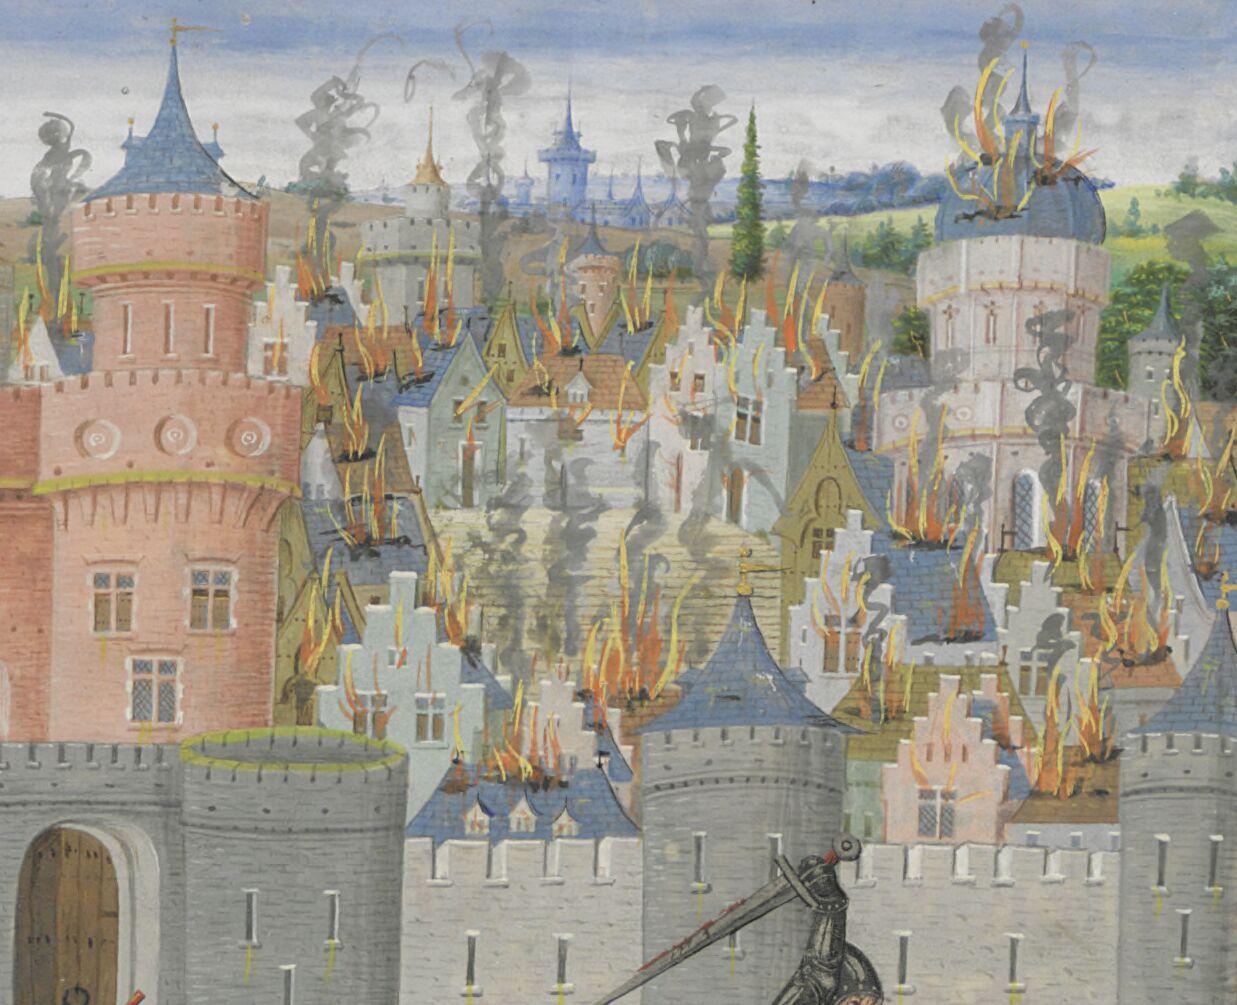 Flemish architecture aflame